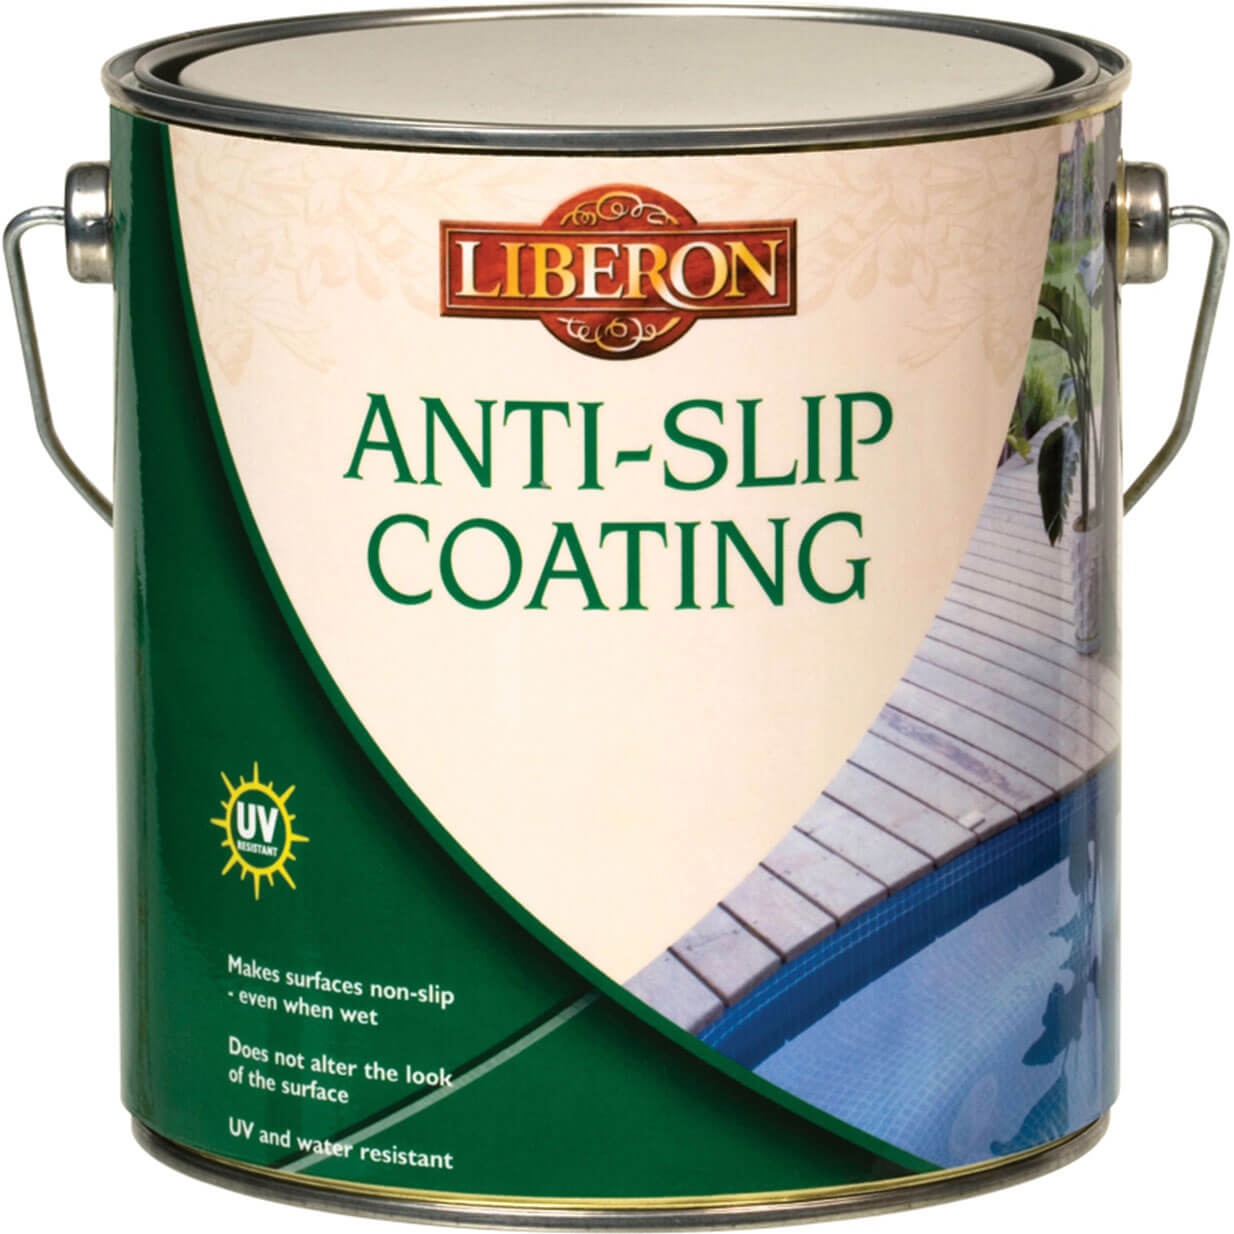 Image of Liberon Anti Slip Coating for Interior & Exterior Floors 2.5l